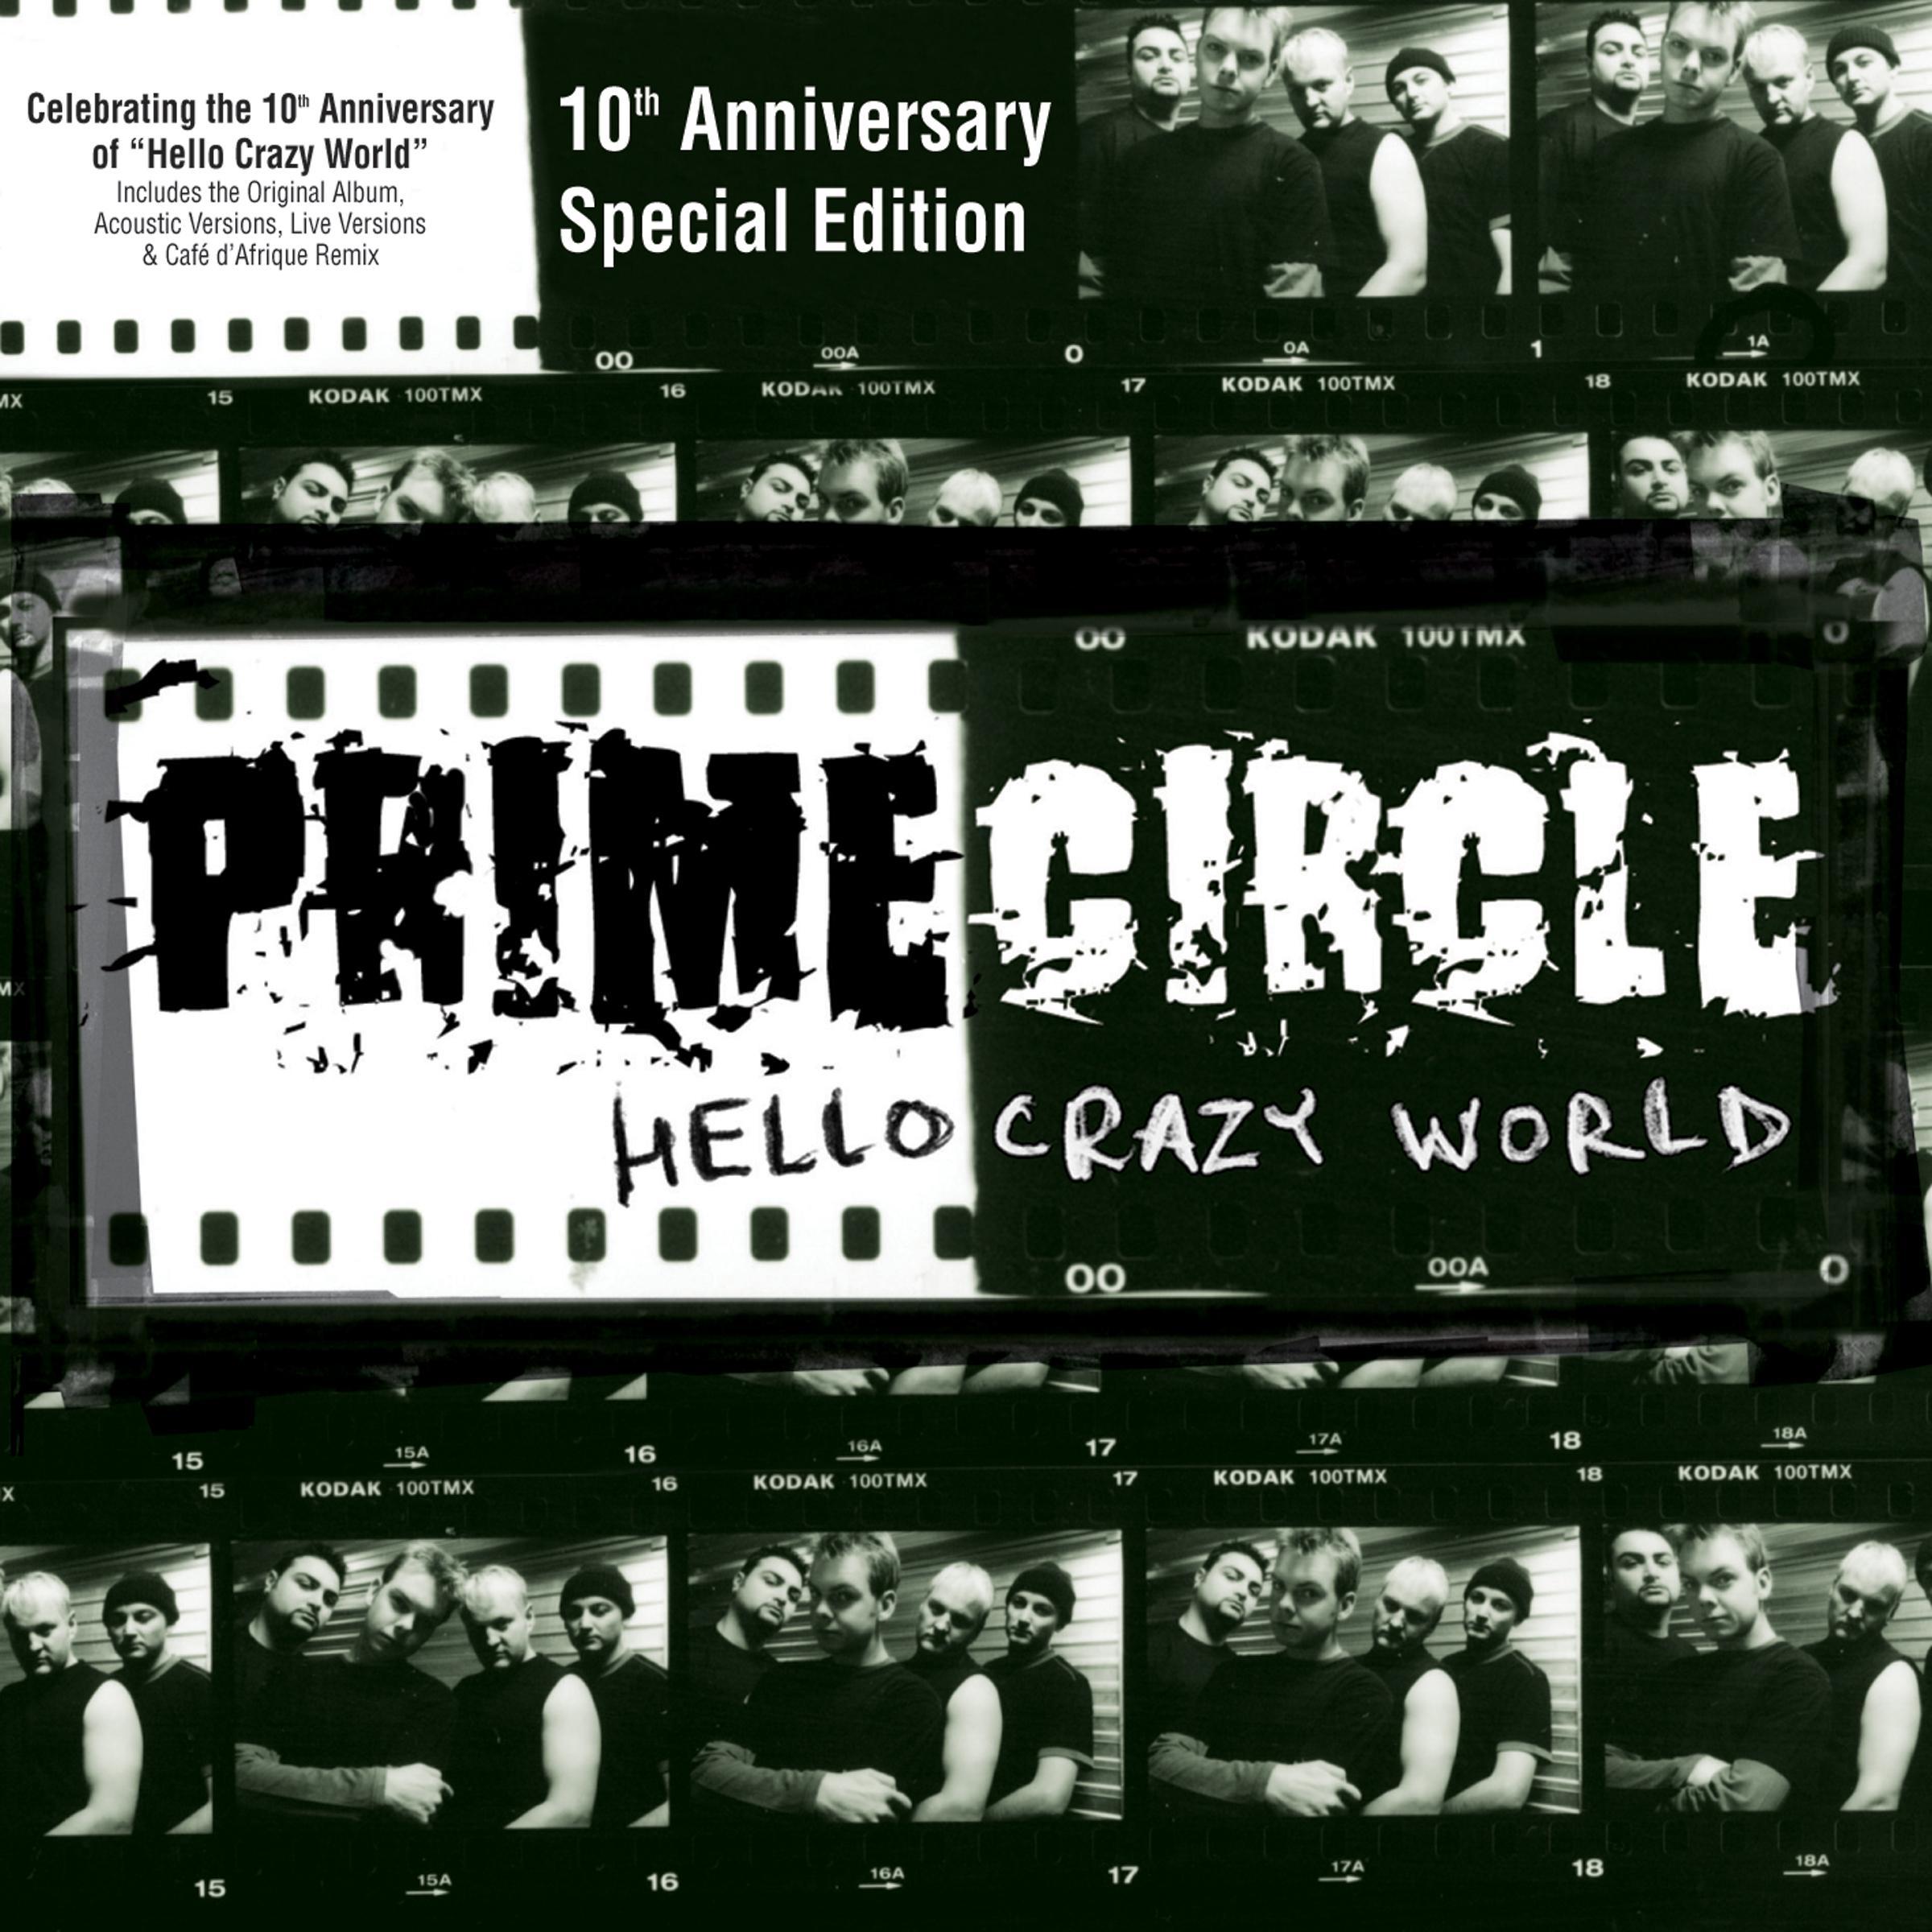 PRIME CIRCLE